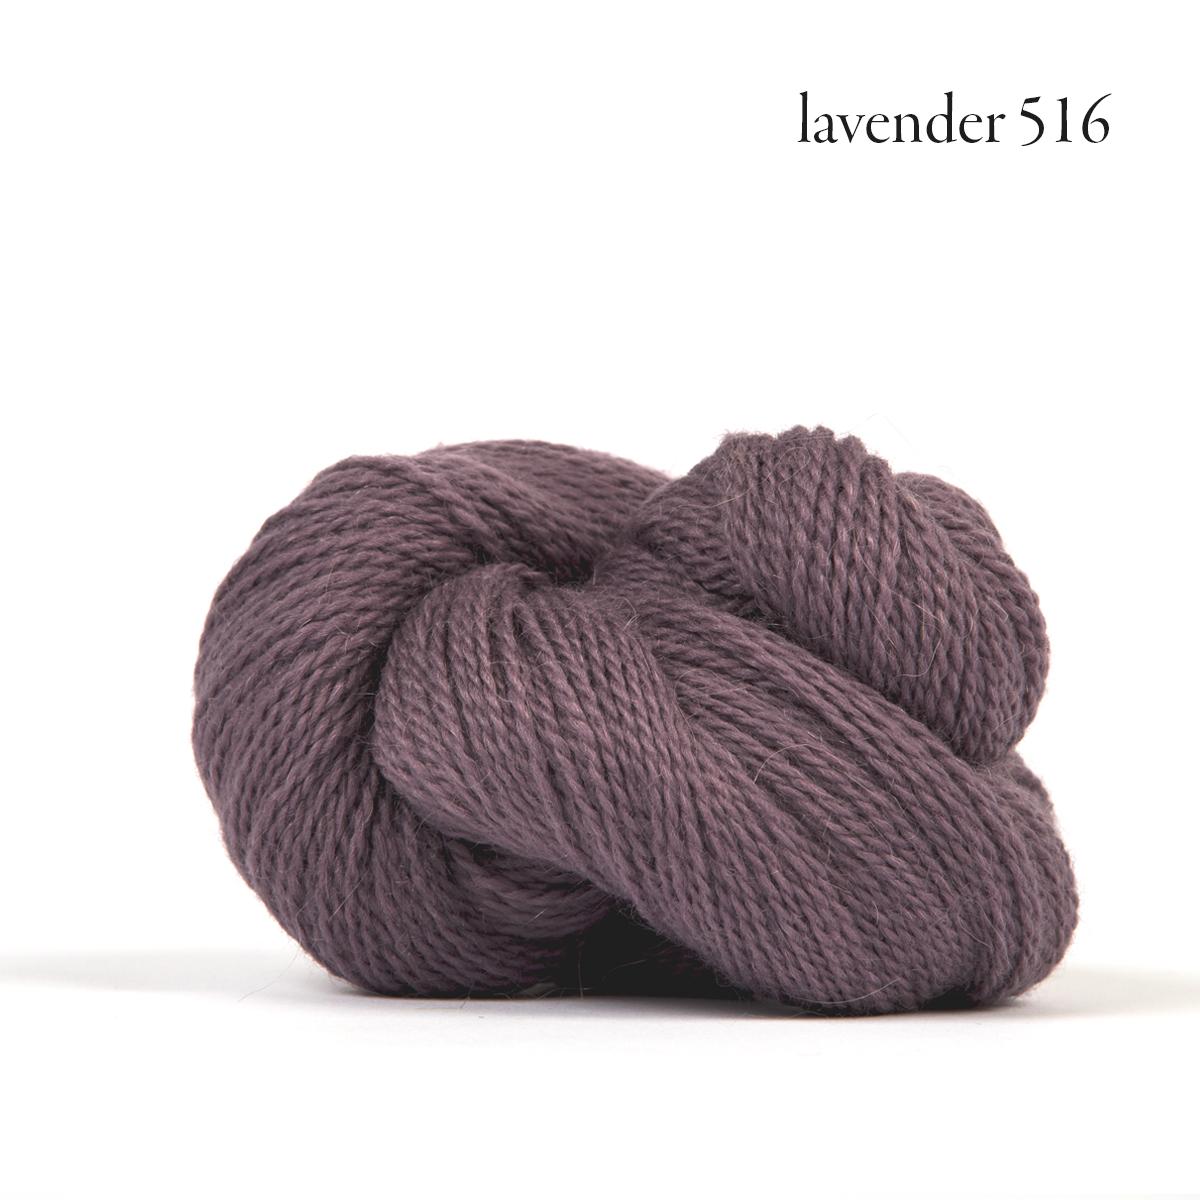 Andorra lavender.jpg